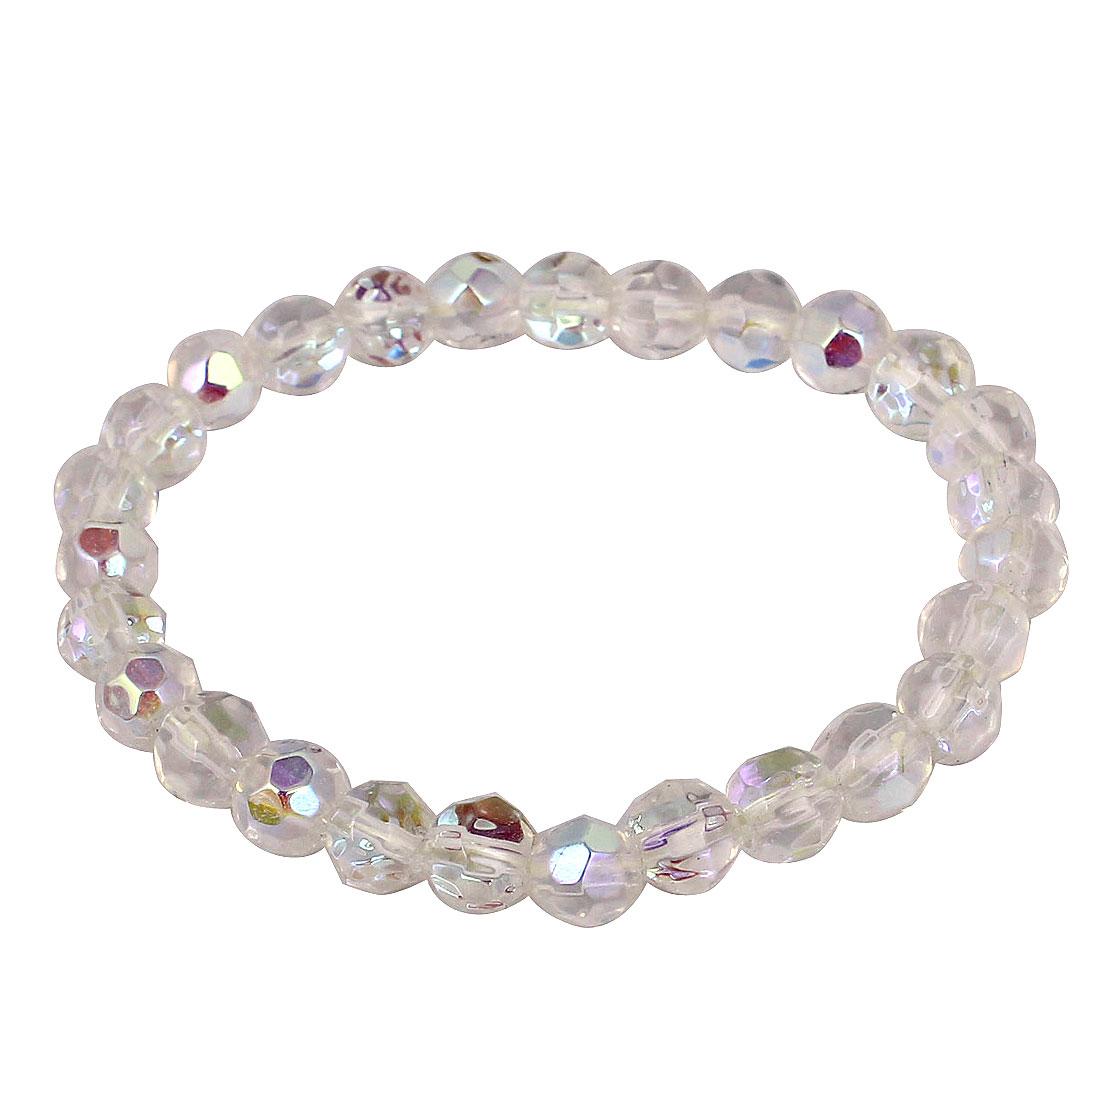 Woman Colorful Faux Crystal Ornament Elastic Wrist Chain Bracelet Bangle